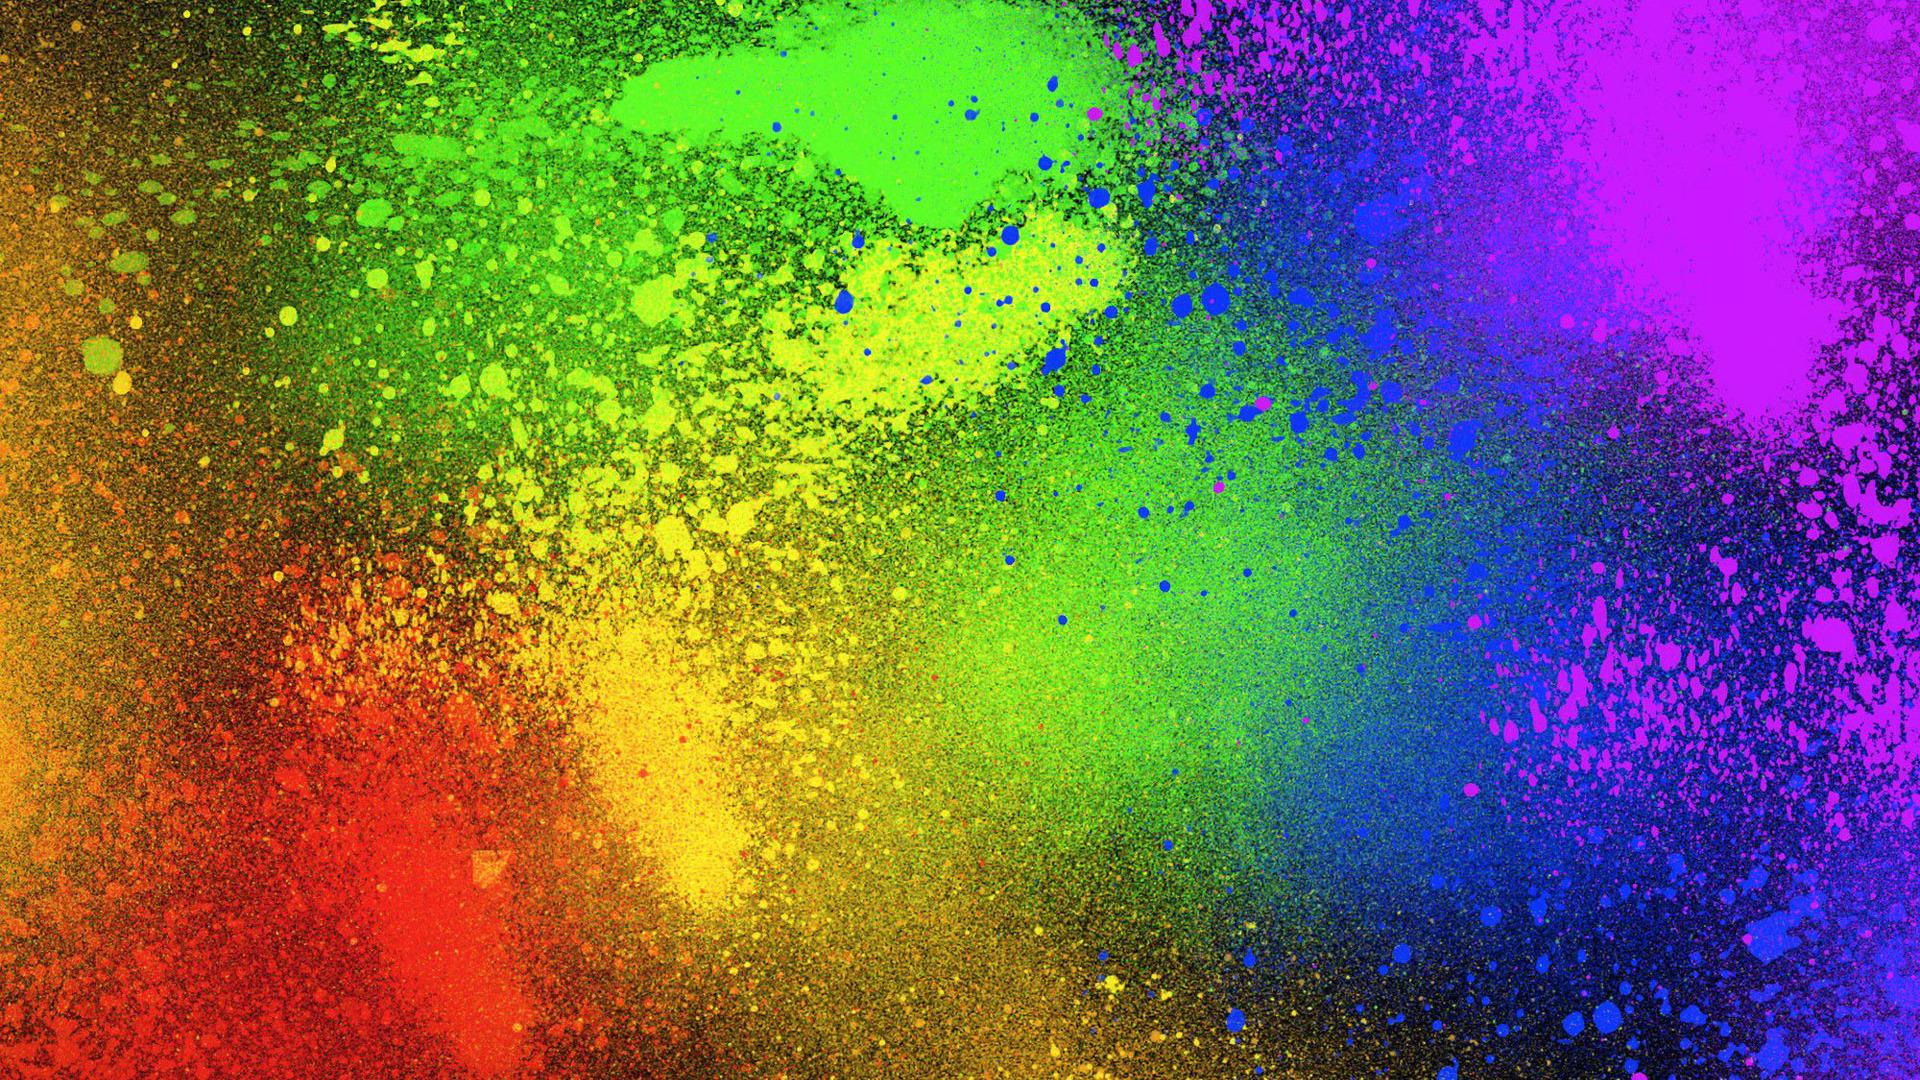 Color splash Widescreen Wallpaper   4781 1920x1080